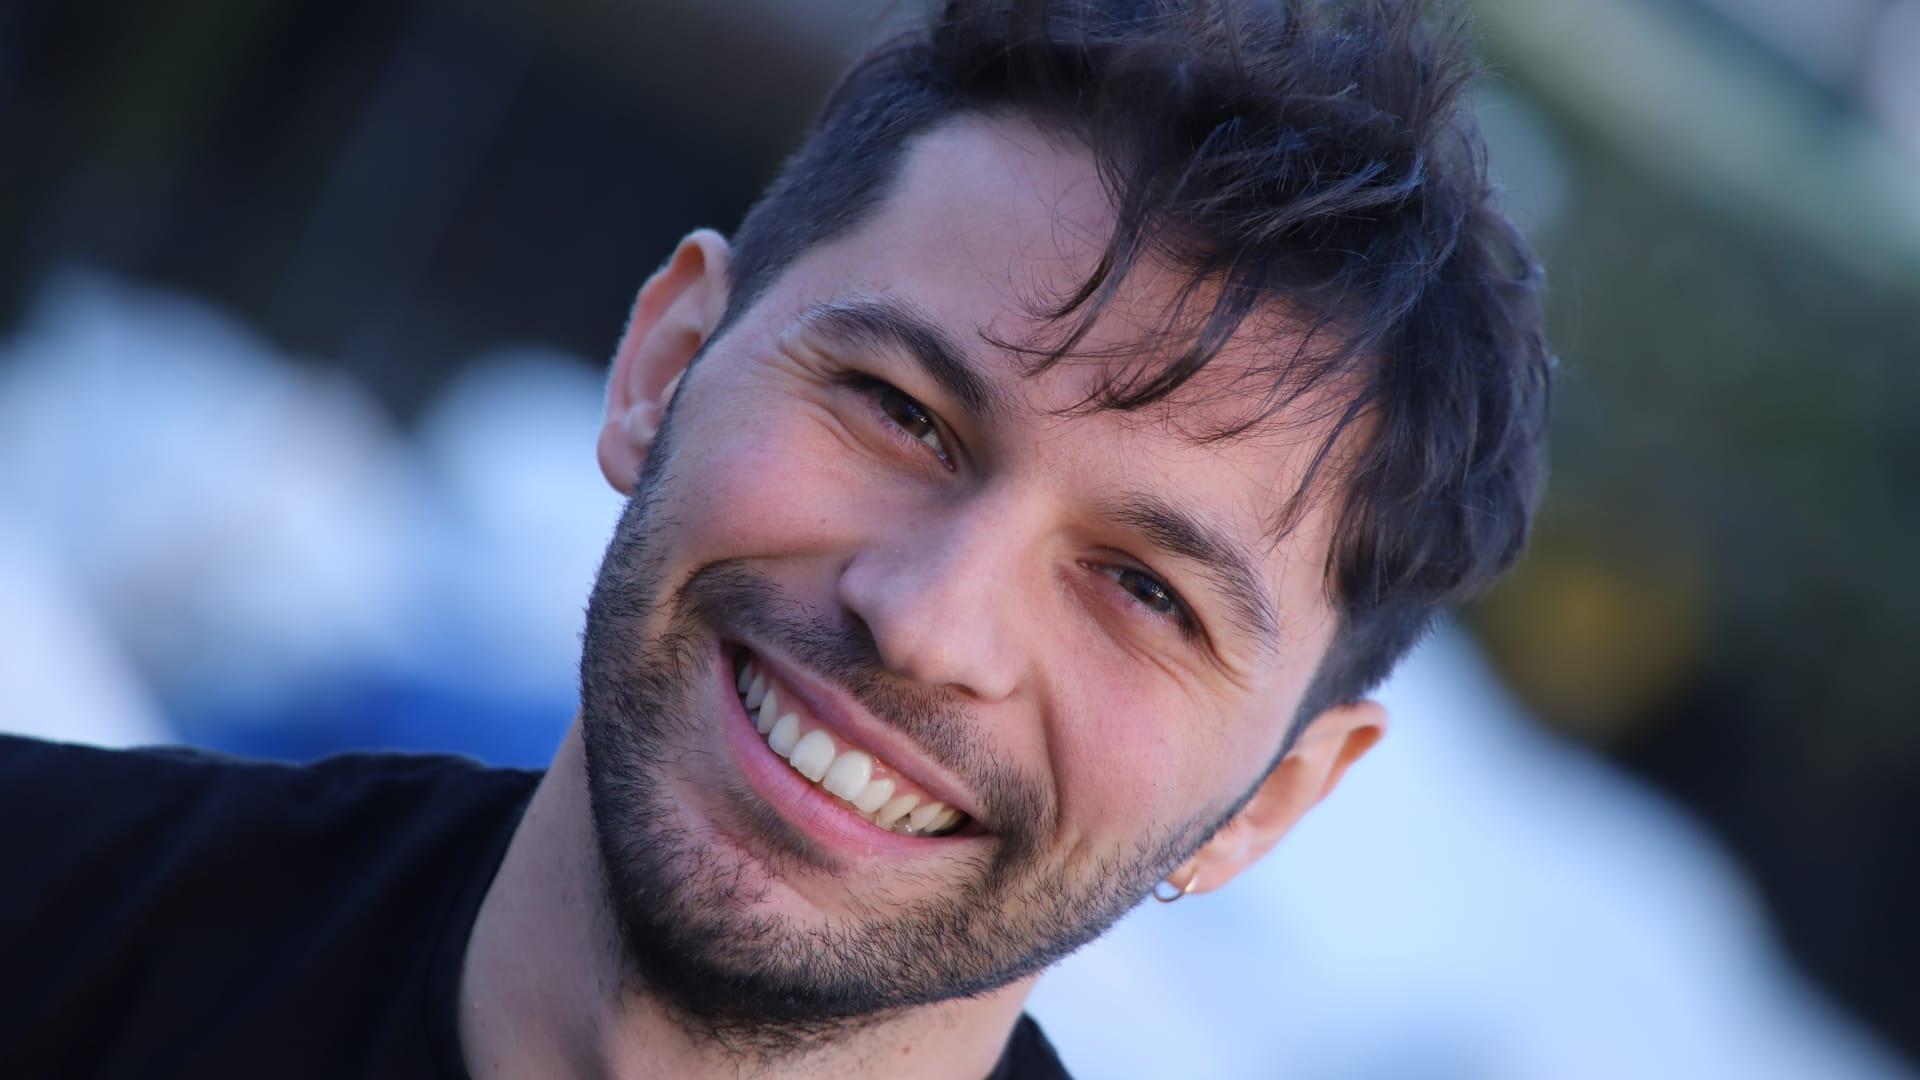 Daniele Mignemi